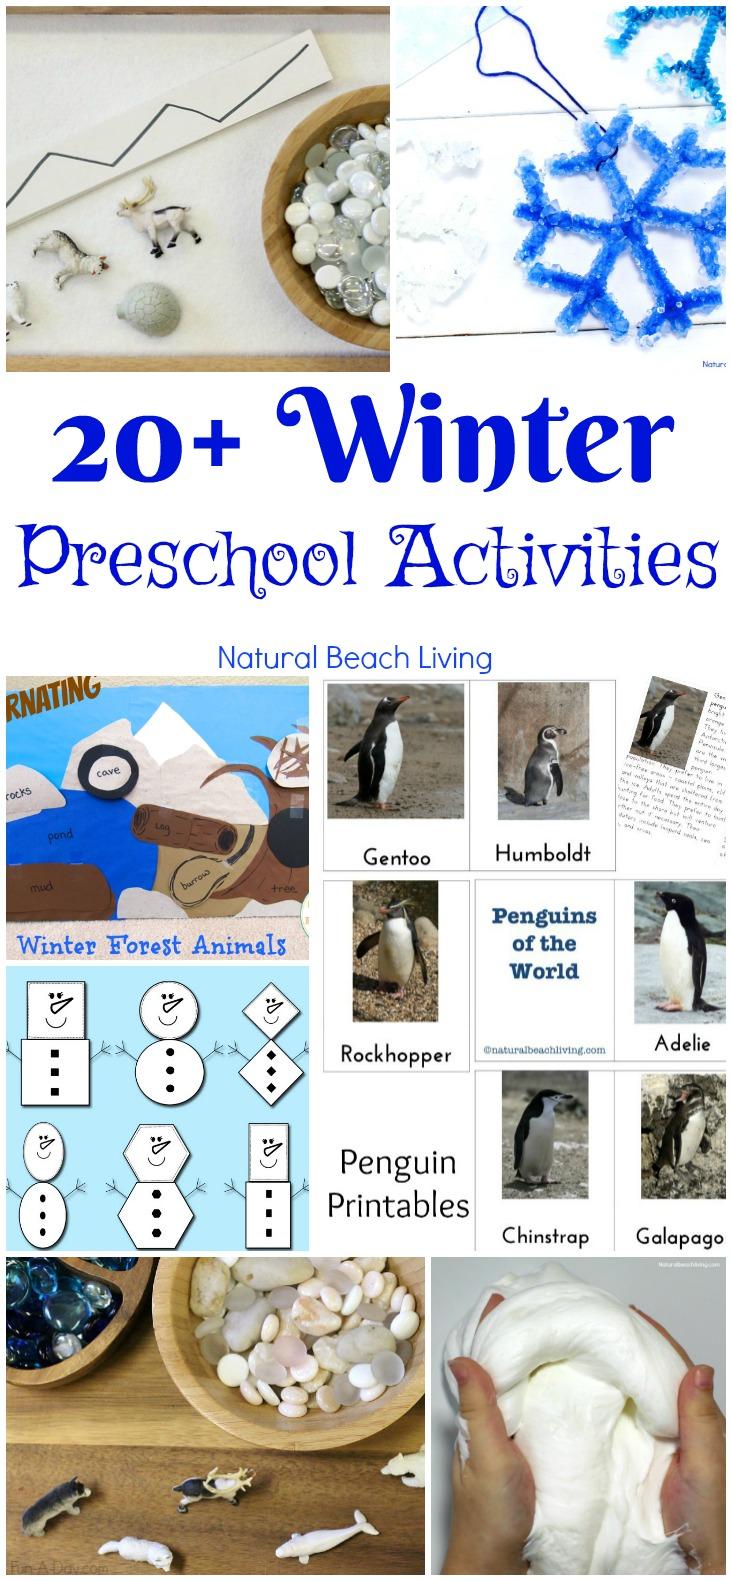 30+ January Preschool Themes and Activities Kids Love